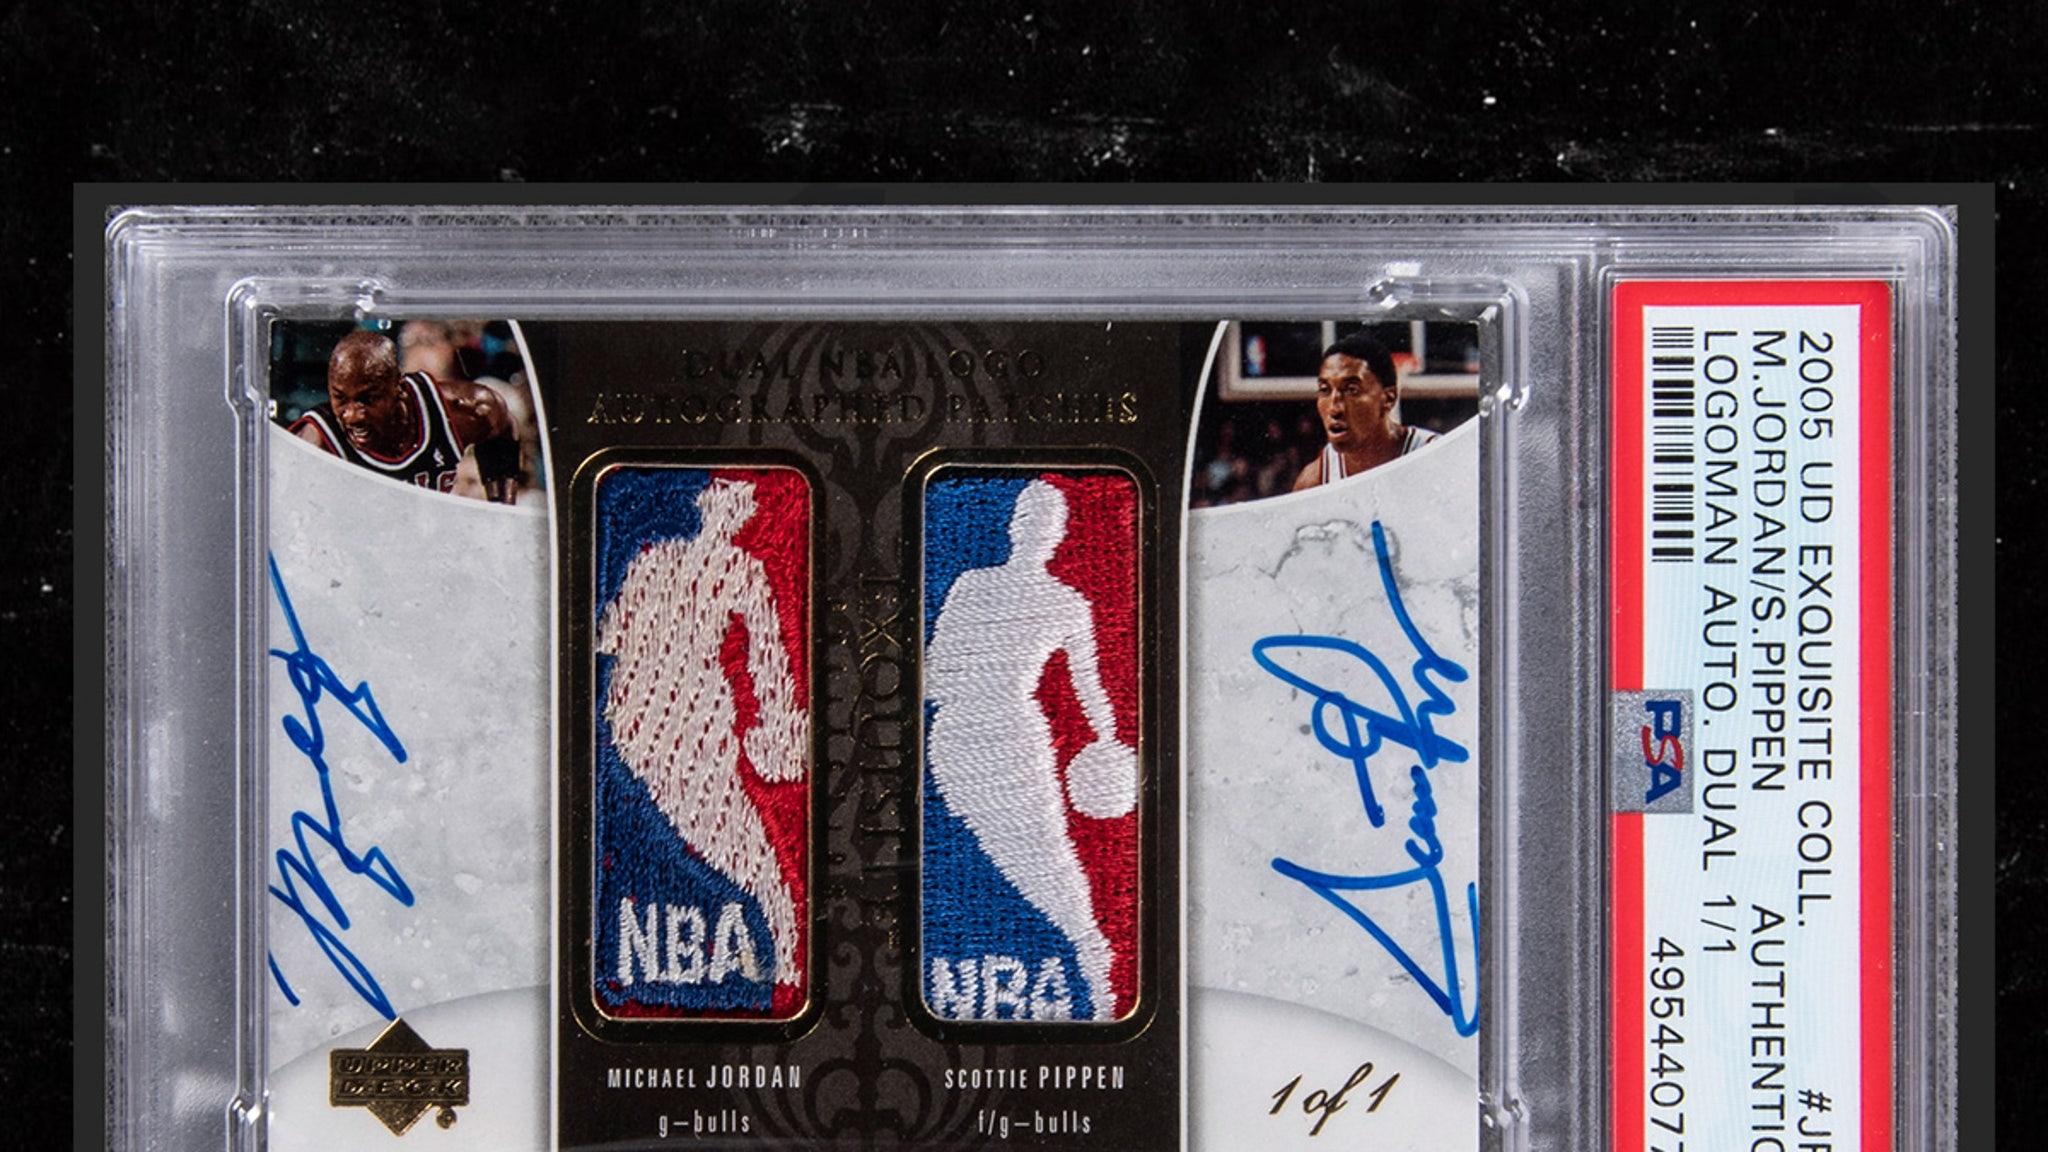 Michael Jordan & Scottie Pippen Signed Super-Rare Basketball Card Hits Auction Block